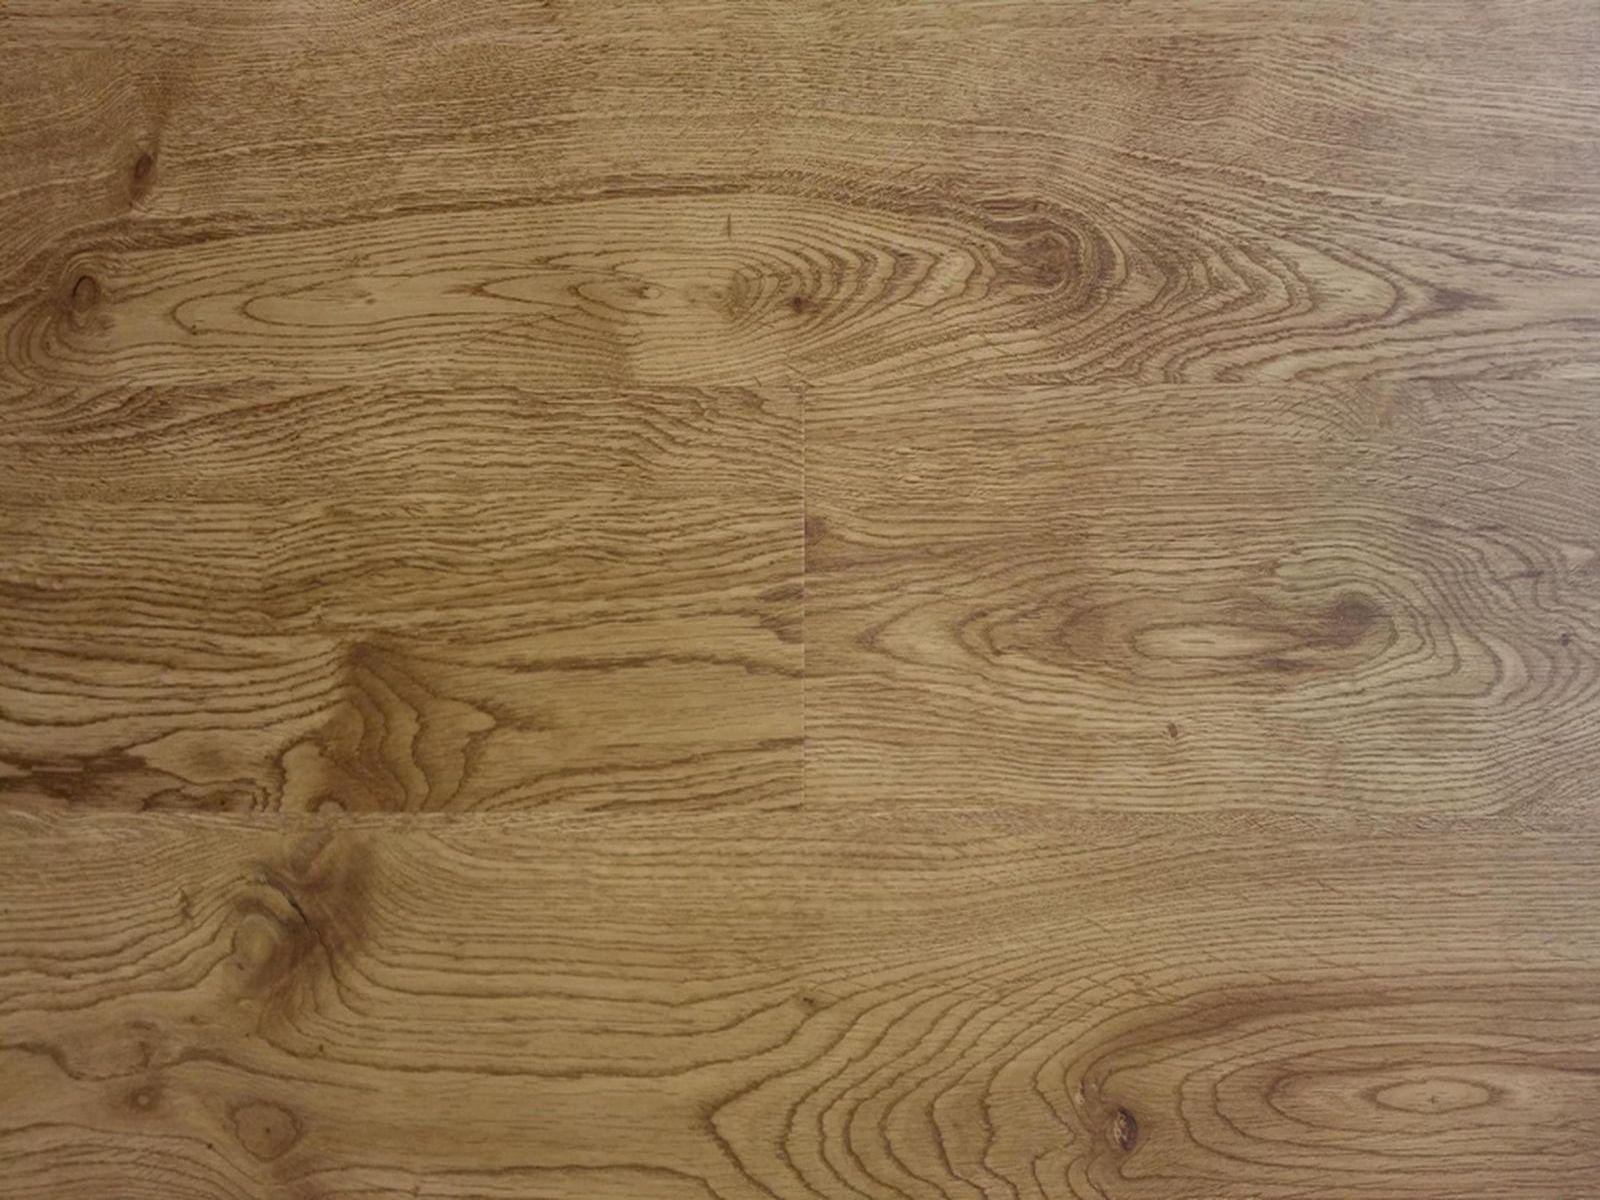 Vinylová podlaha BUKOMA CLICK - DUB PIREUS NATURAL - 5mm/0,5mm